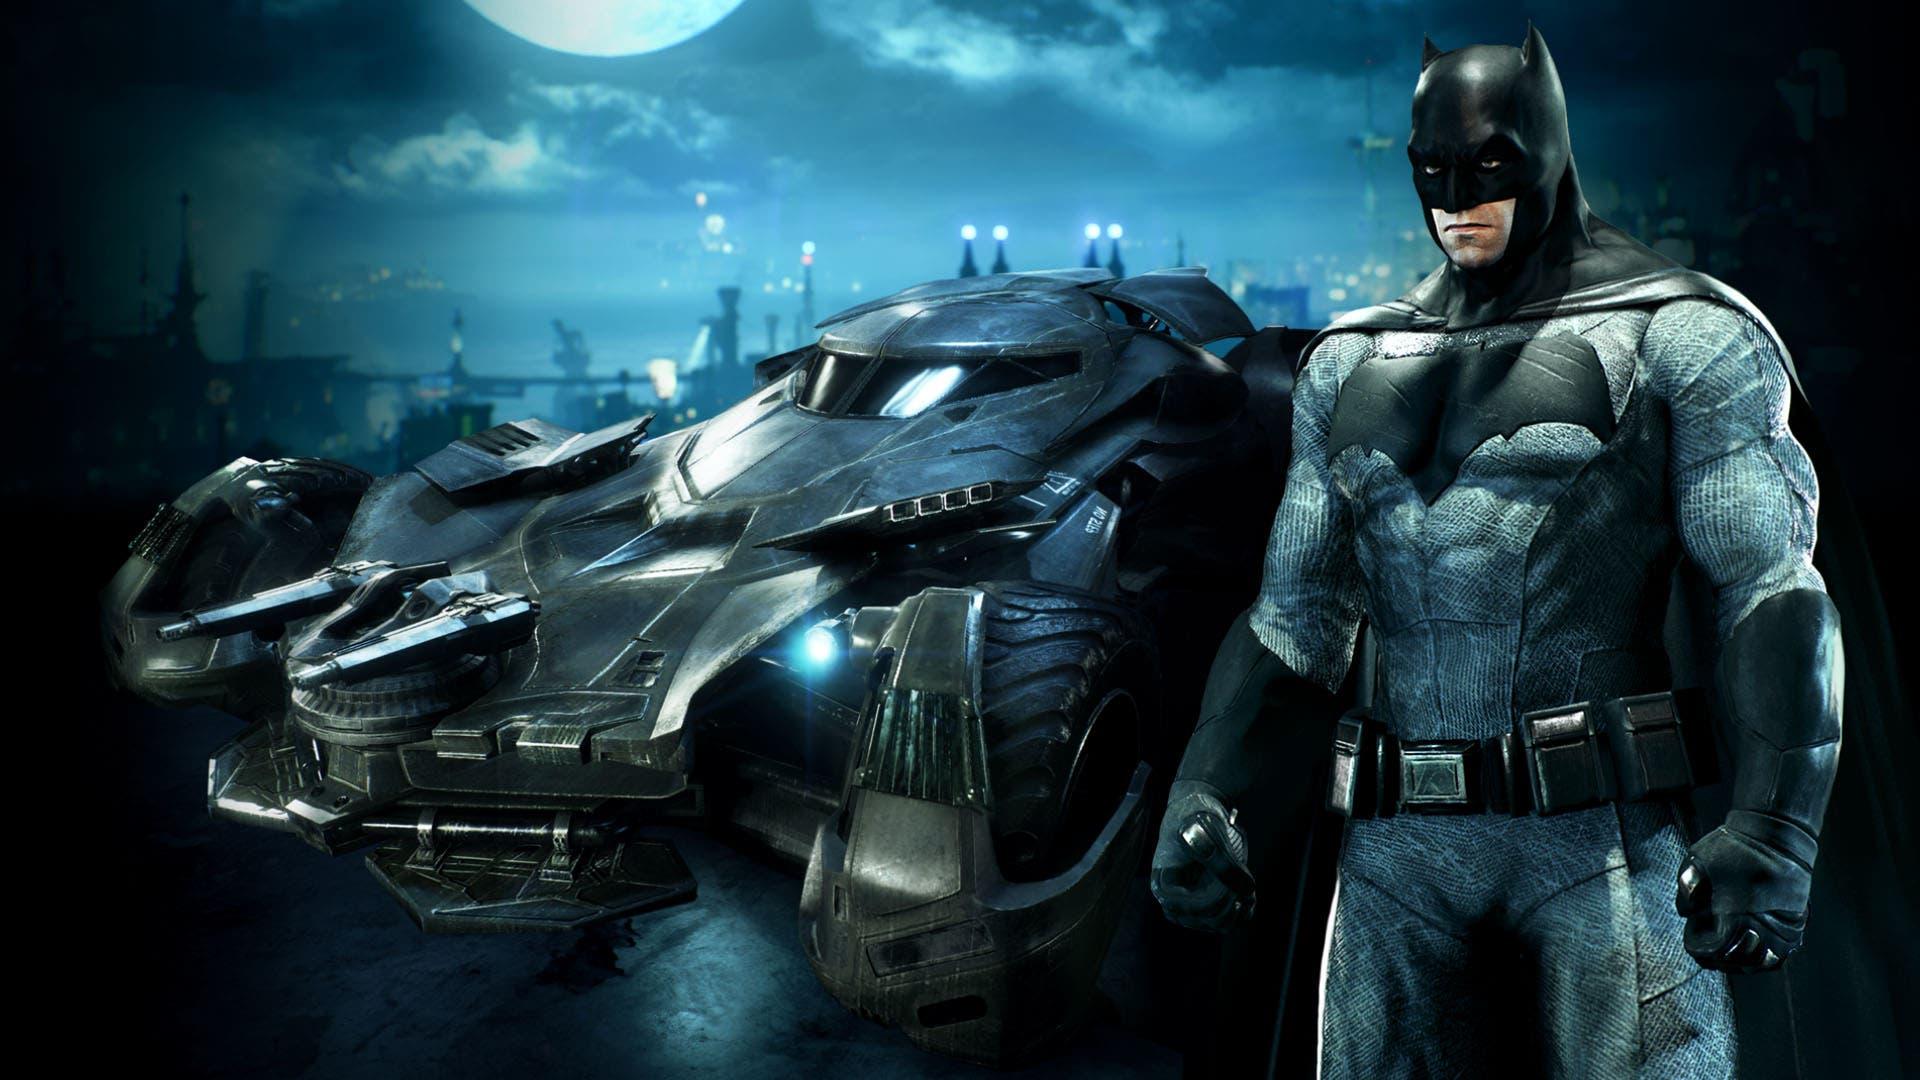 Batman v Superman Batmobile Pack